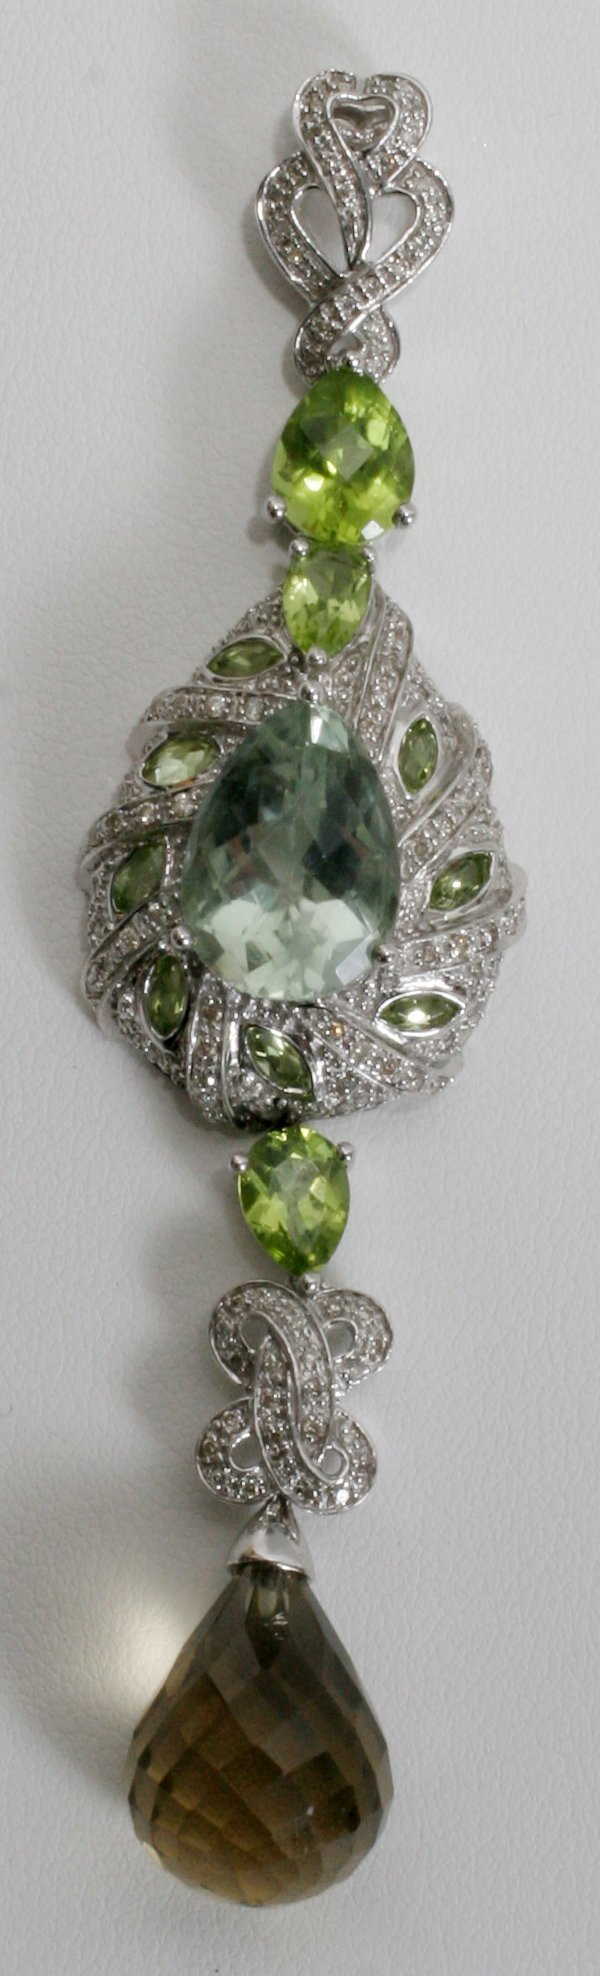 050004: DIAMOND, QUARTZ, AMETHYST & GOLD PENDANT